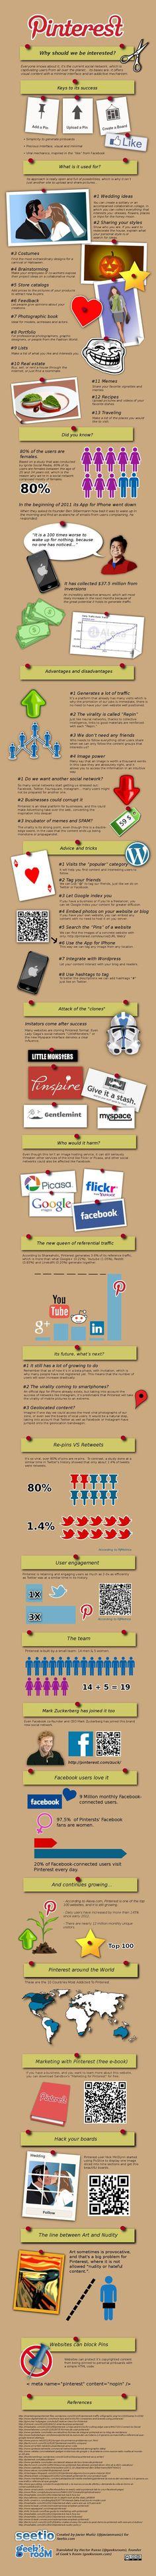 advertise here          Home      Apps      Design      Entertainment      Geek      Interviews      Lifestyle      Social Media      Technology    Pinterest Mega Fact Sheet & Hacks [Infographic]